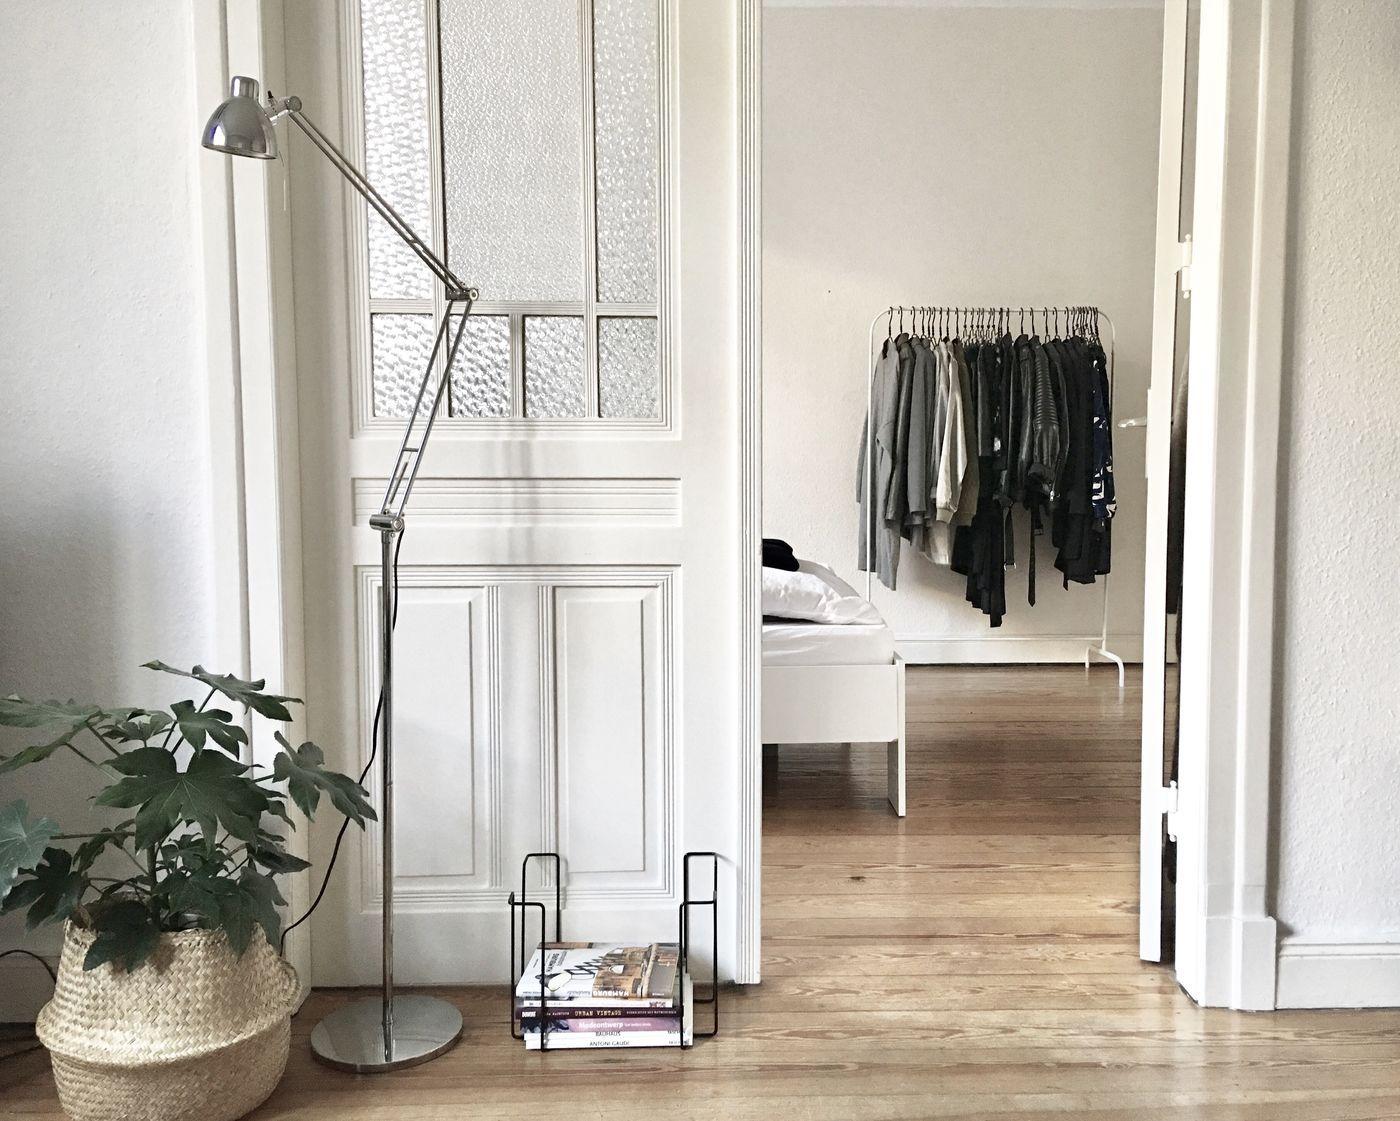 kleiderstange ideen bilder. Black Bedroom Furniture Sets. Home Design Ideas